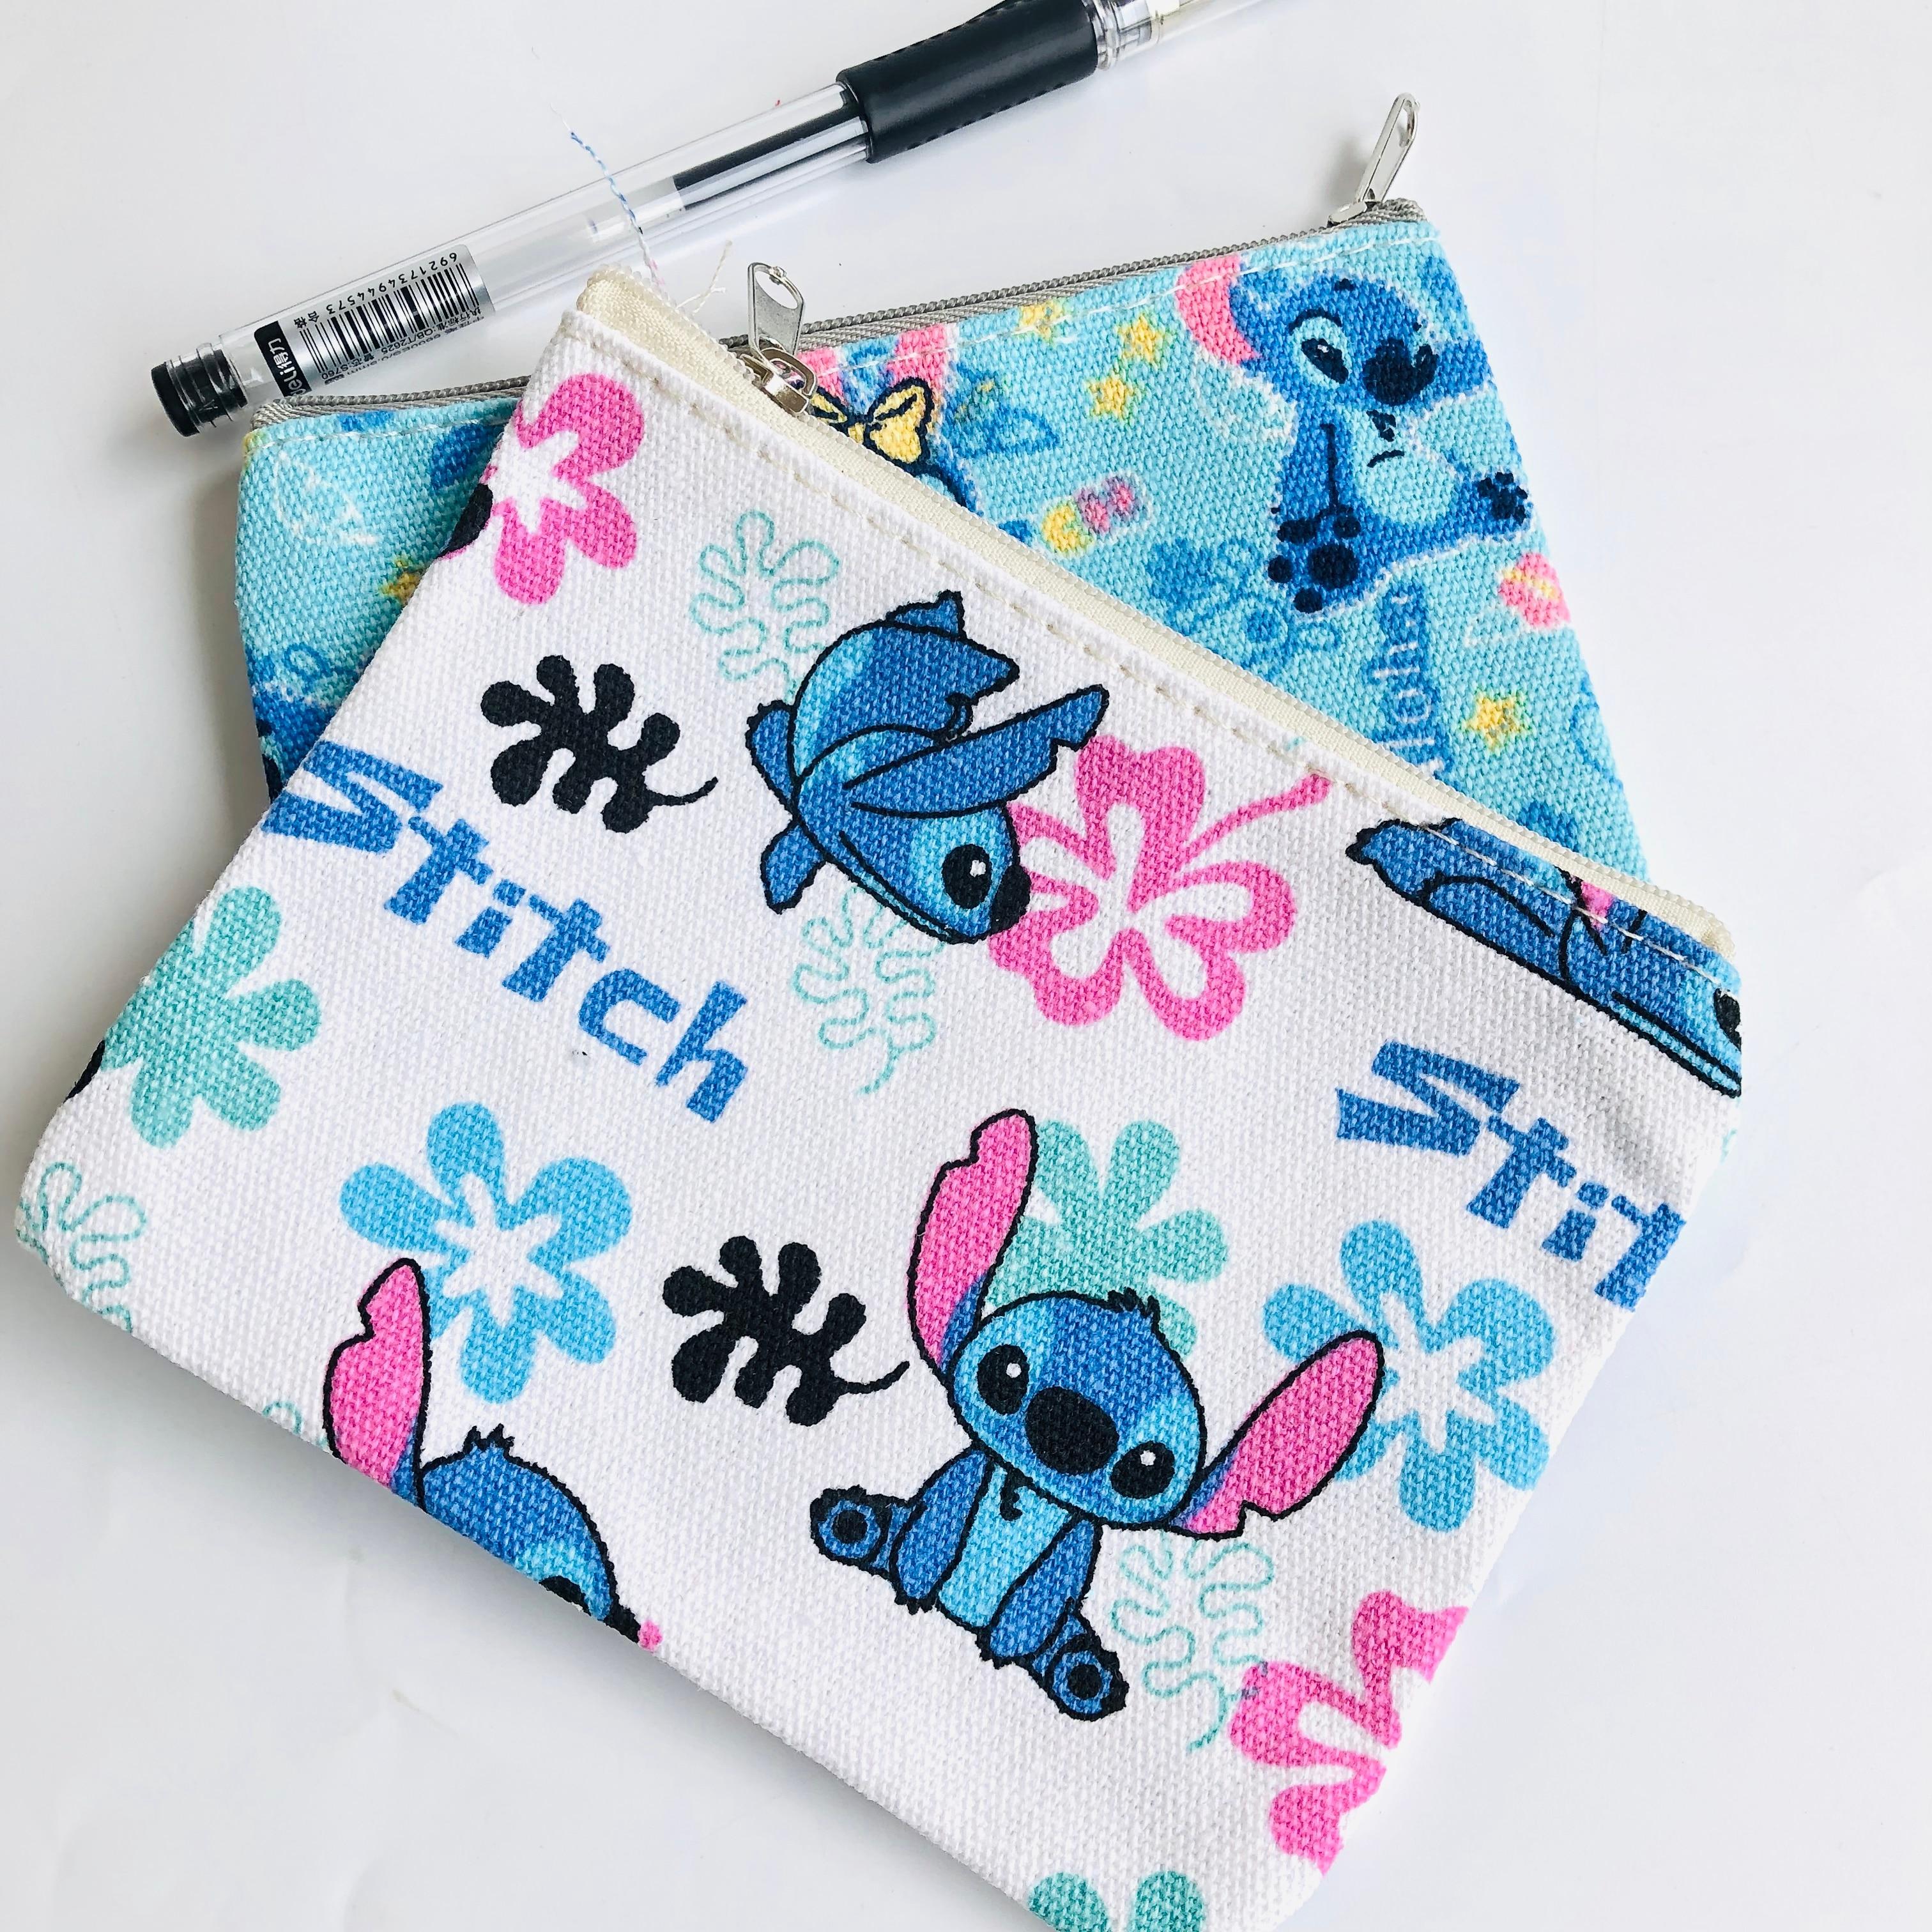 IVYYE 1PCS Stitch Penguin Anime Canvas Coin Purse Cartoon Soft Change Bags Coins  Money Wallet Card Key Storage Gift